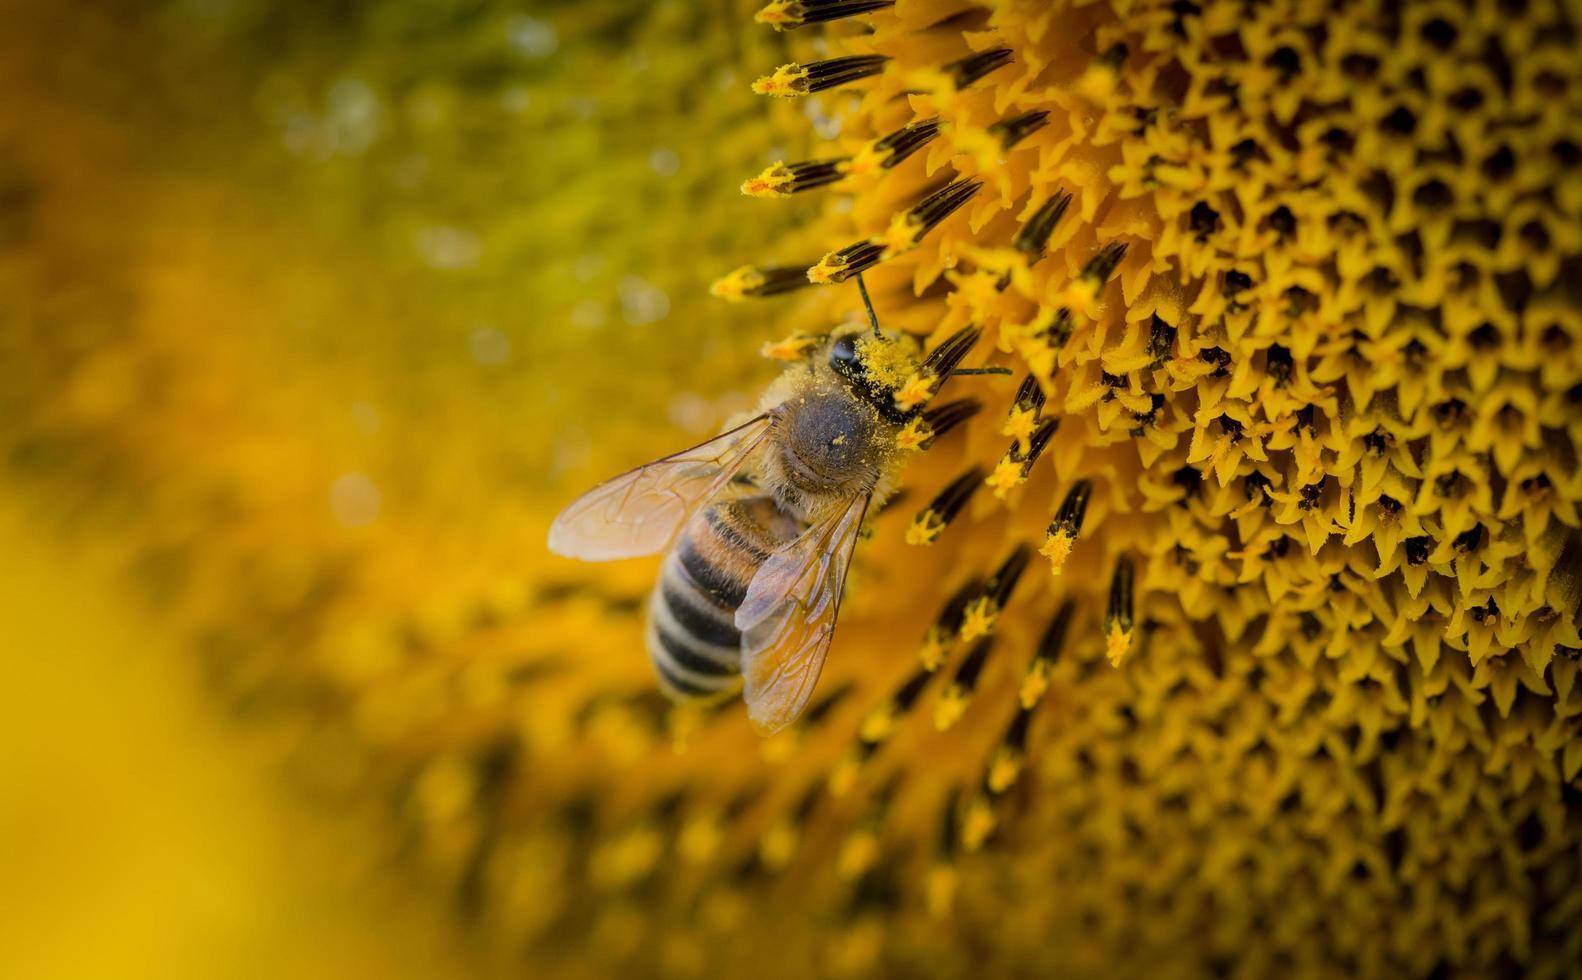 Macro photo of a bee